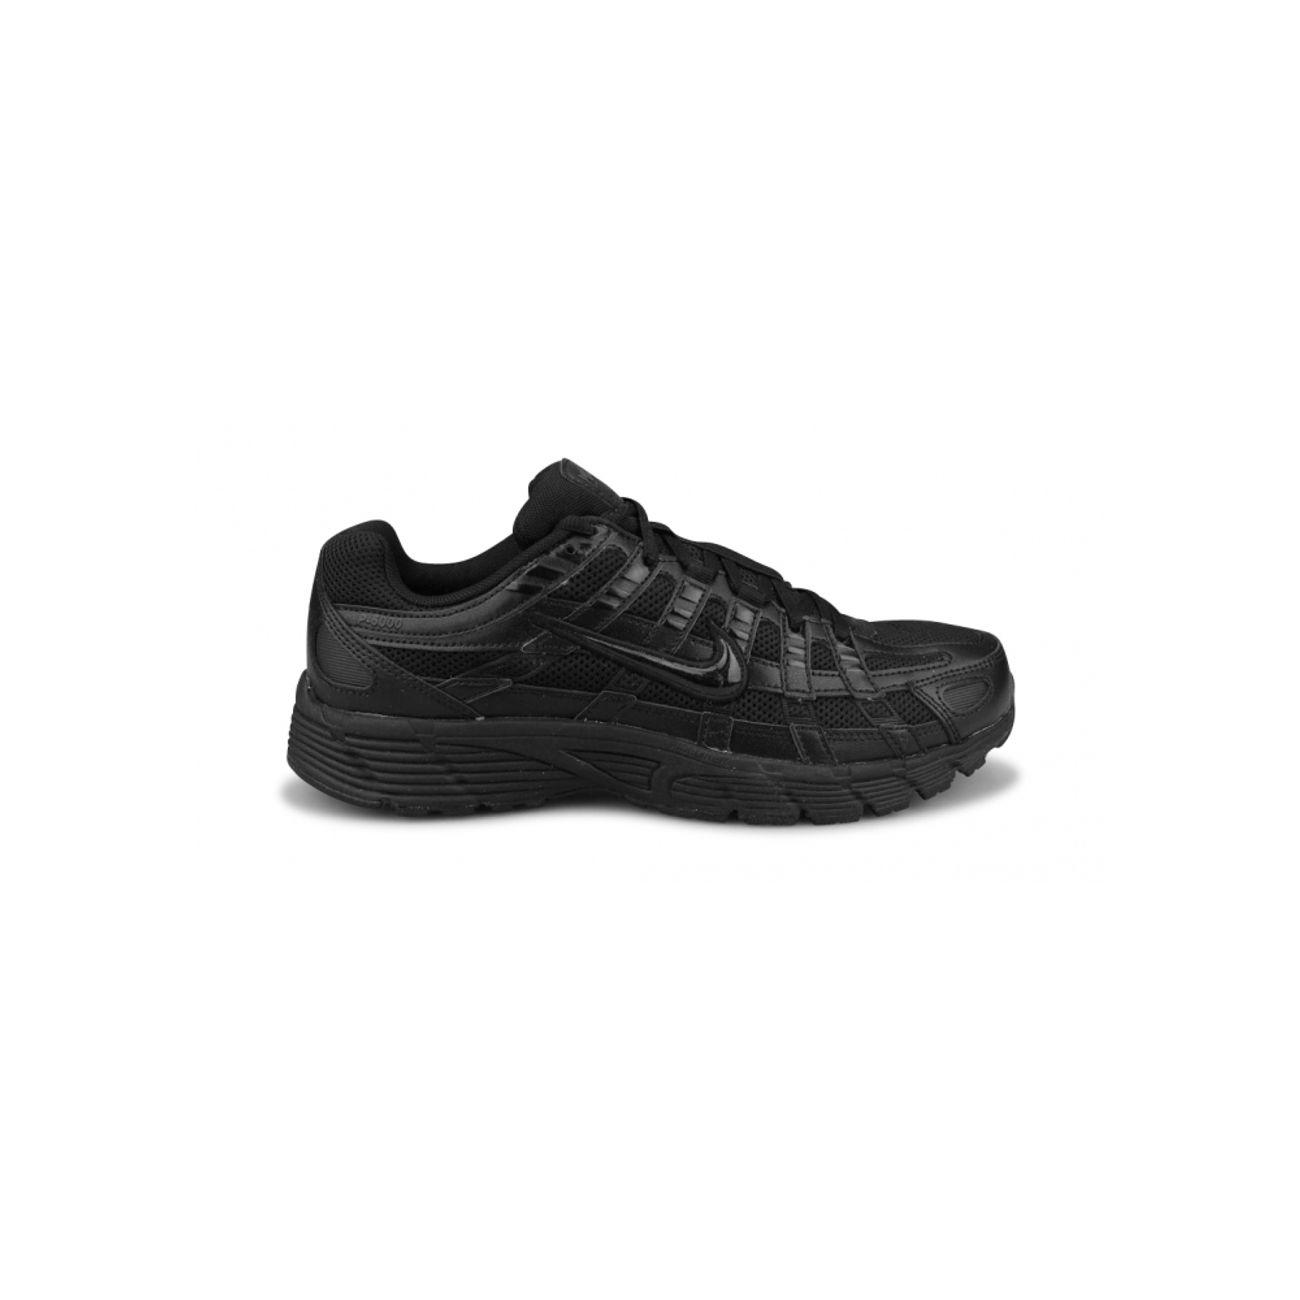 Mode- Lifestyle homme NIKE Basket Nike P-6000 Noir Cd6404-002